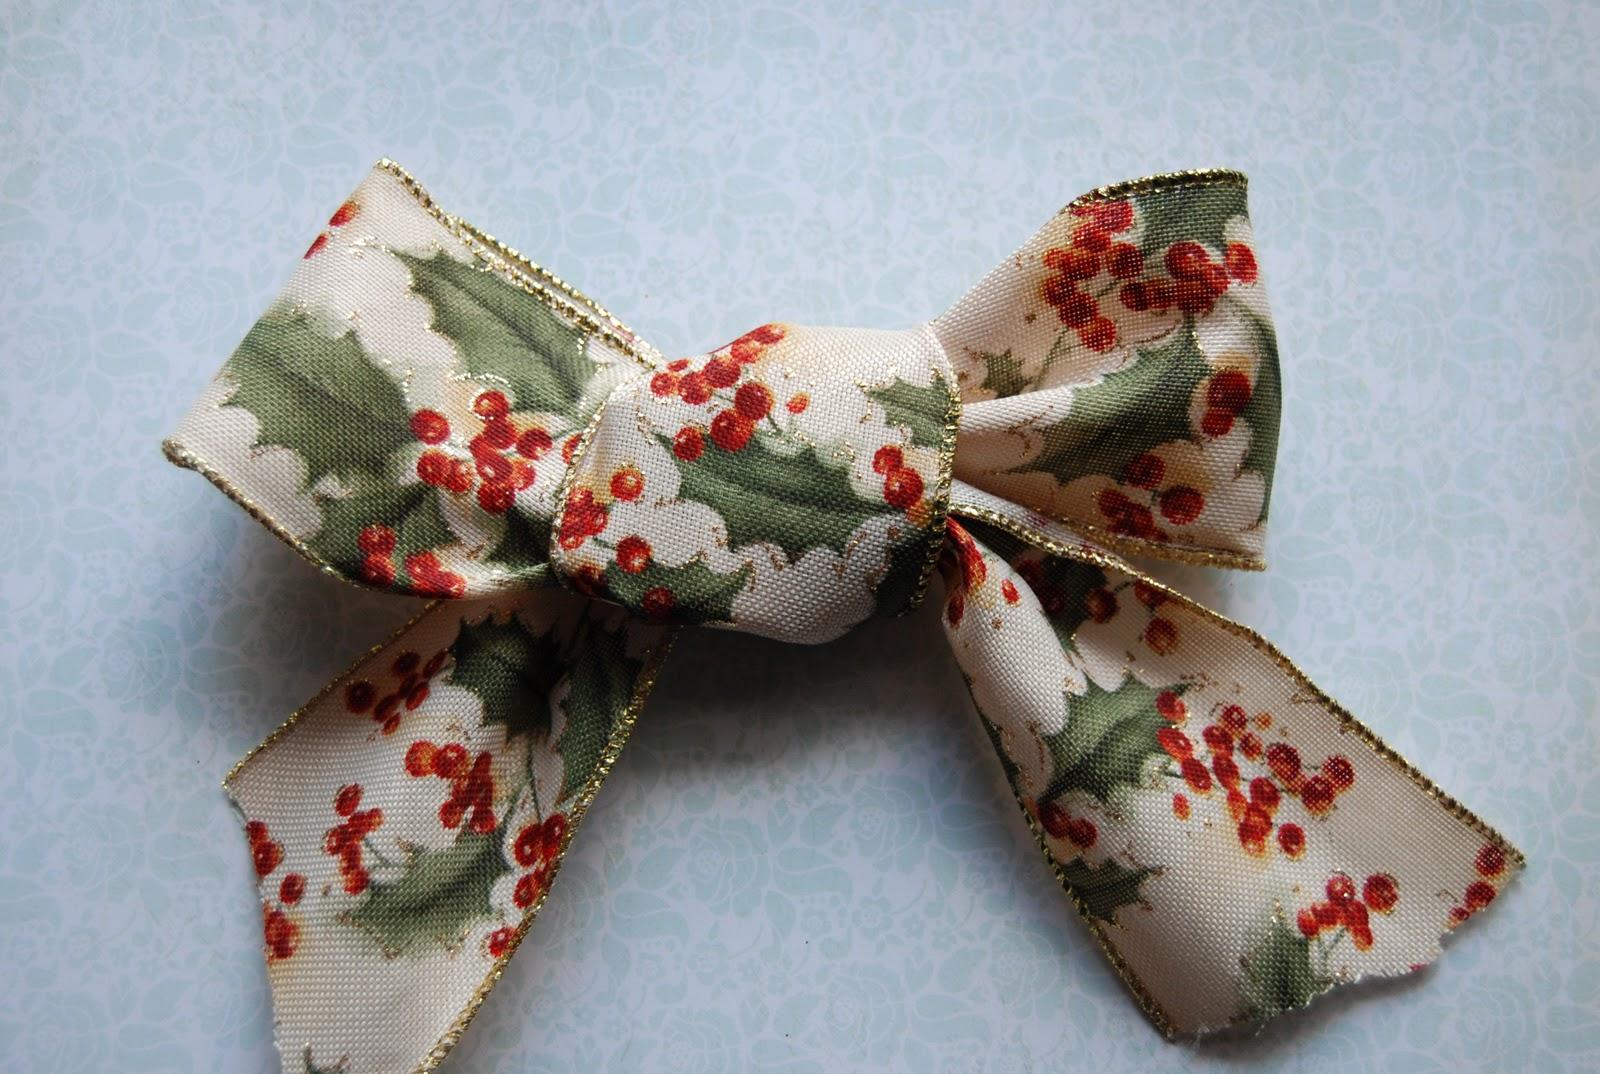 si queris adquirir estas cintas para vuestras navideas mndame un mail a